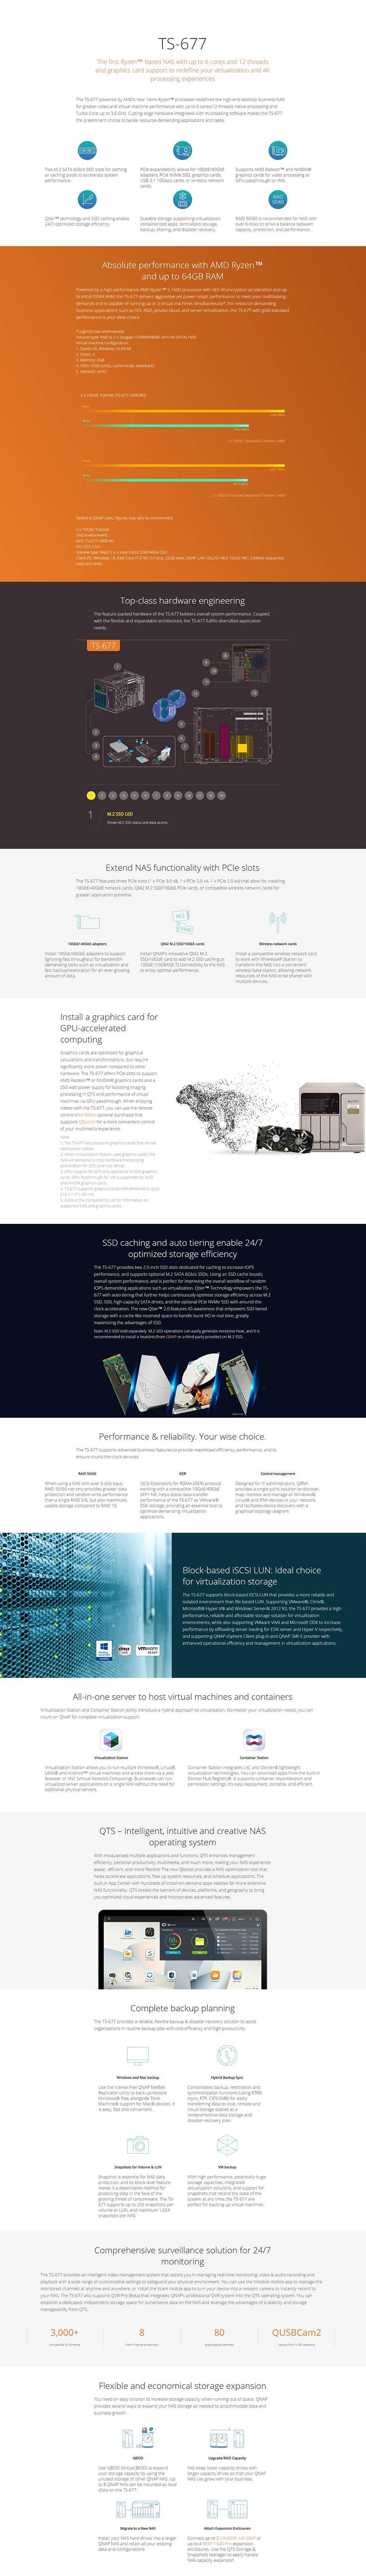 QNAP TS-677-1600-8G 6-Bay Diskless NAS - AMD Ryzen 5 1600 6-Core CPU 8GB - Desktop Overview 1